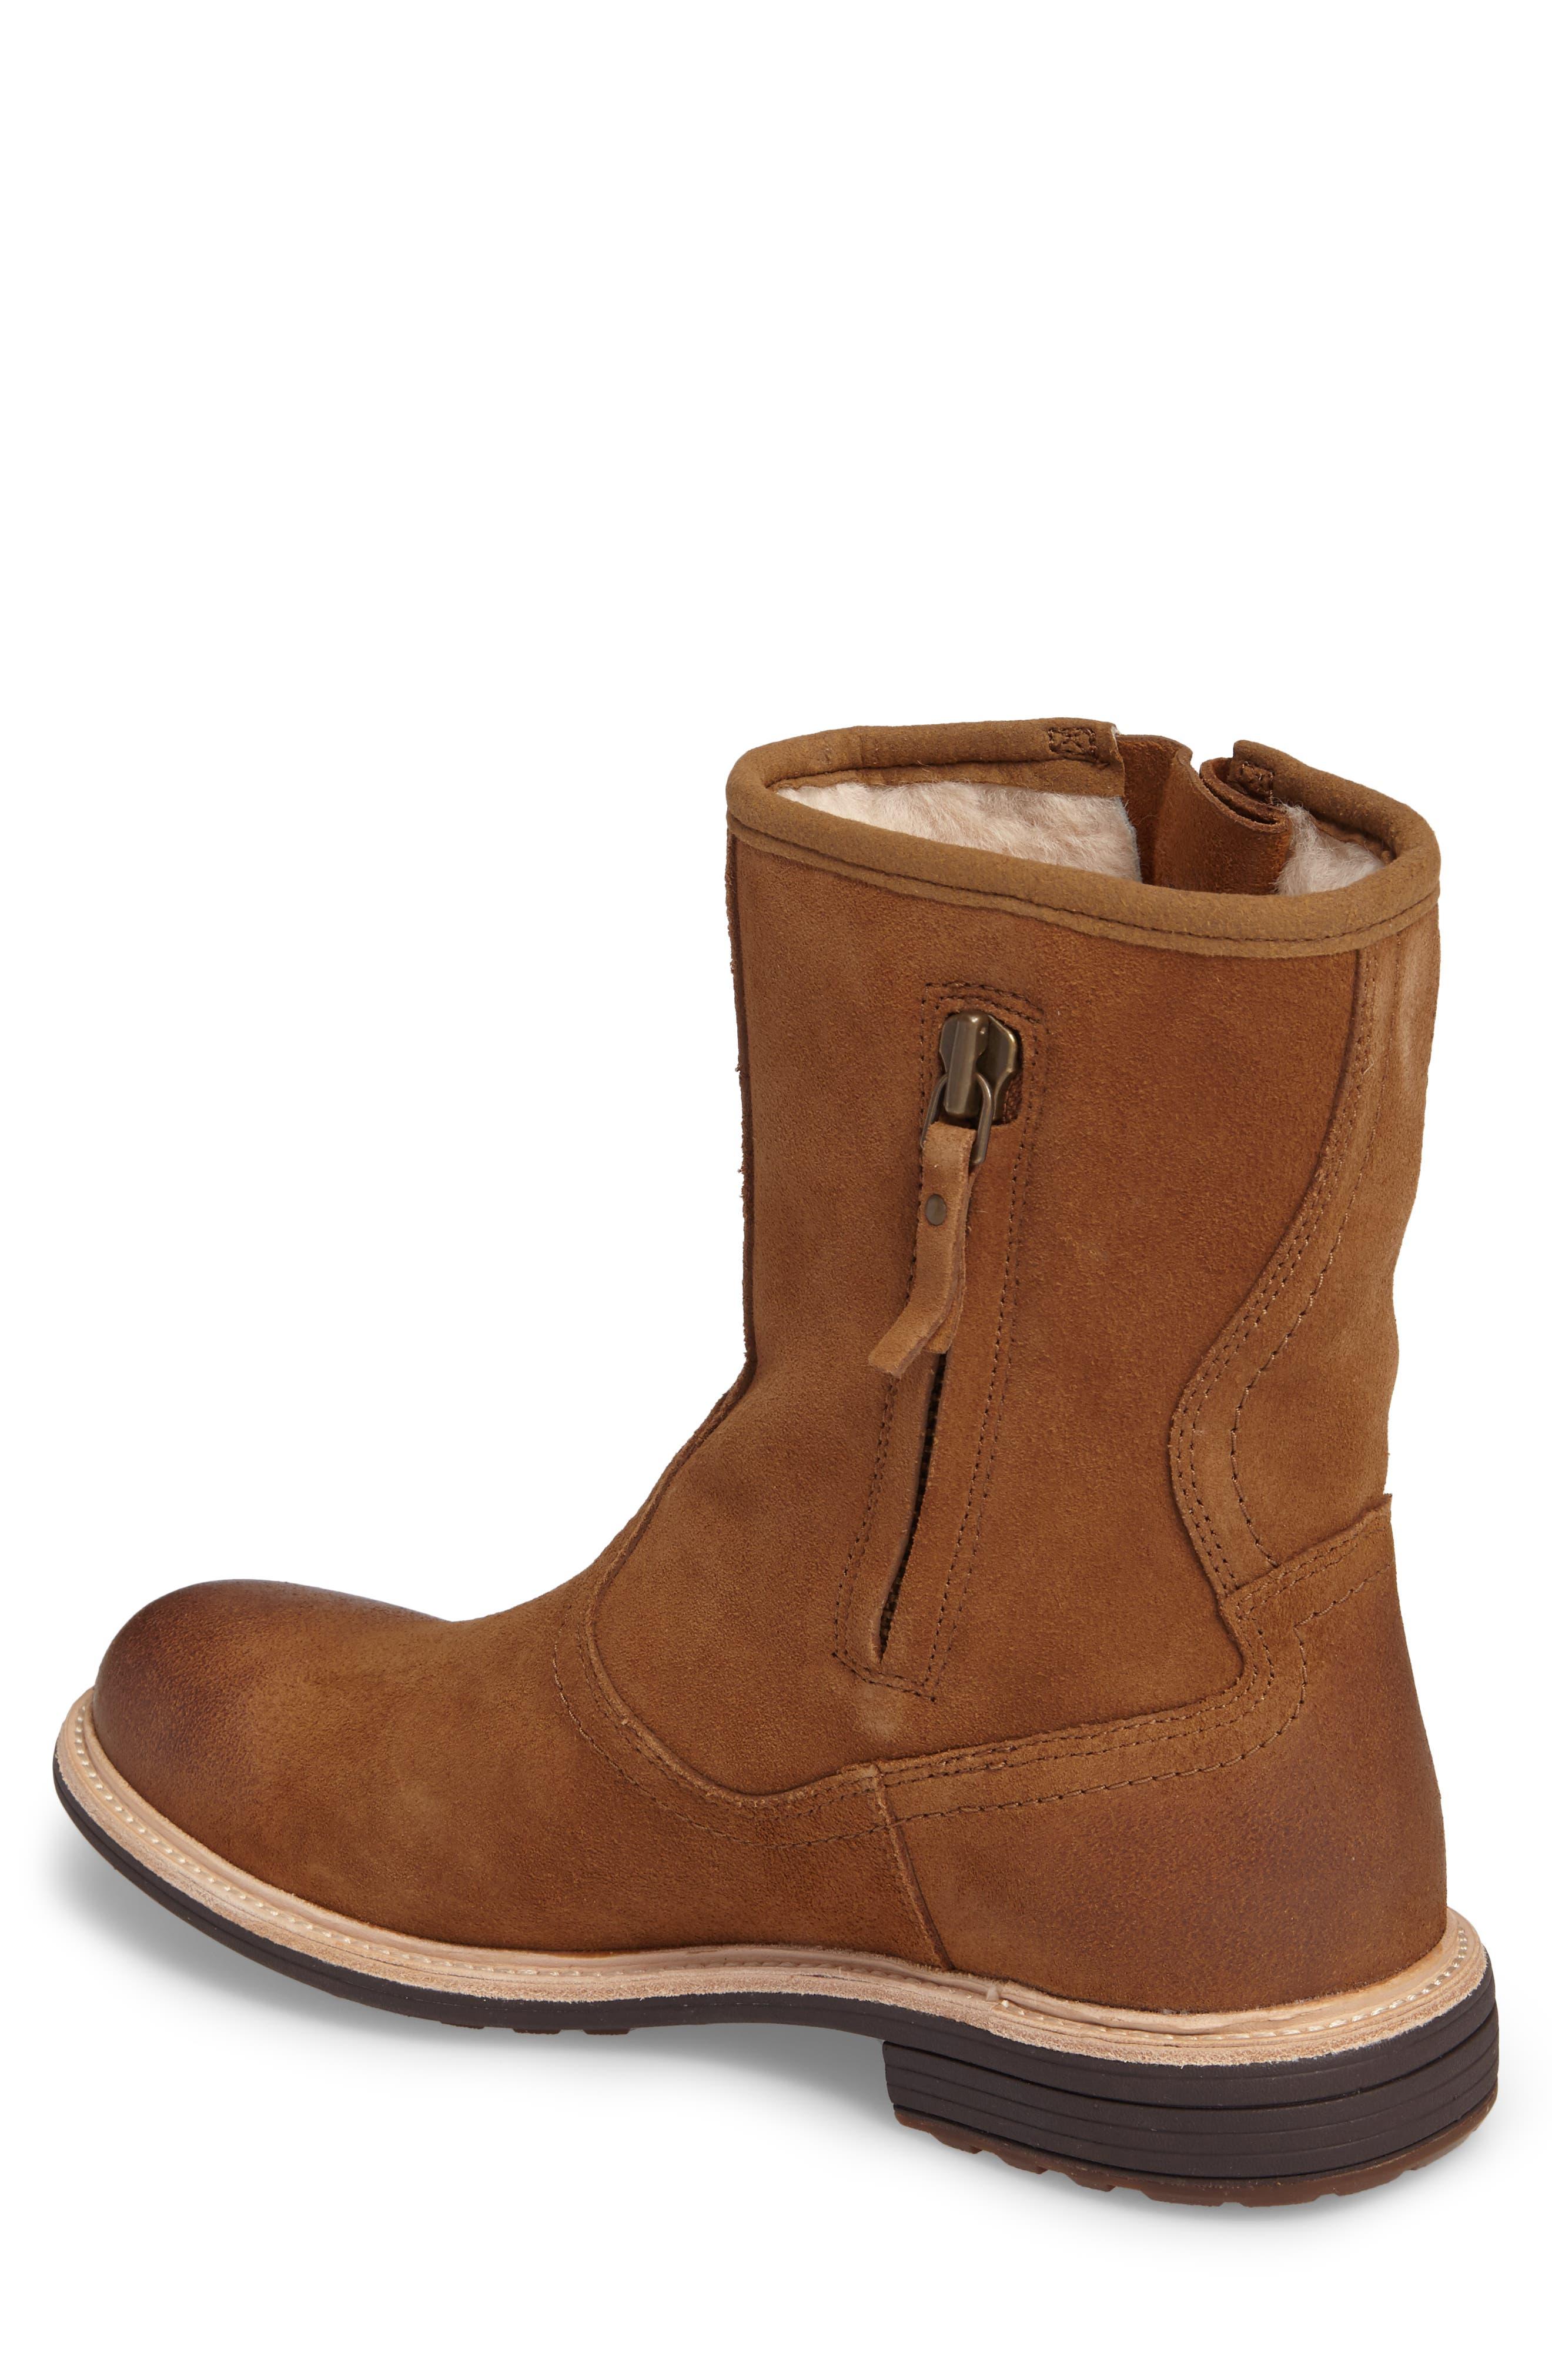 Jaren Zip Boot with Genuine Shearling,                             Alternate thumbnail 4, color,